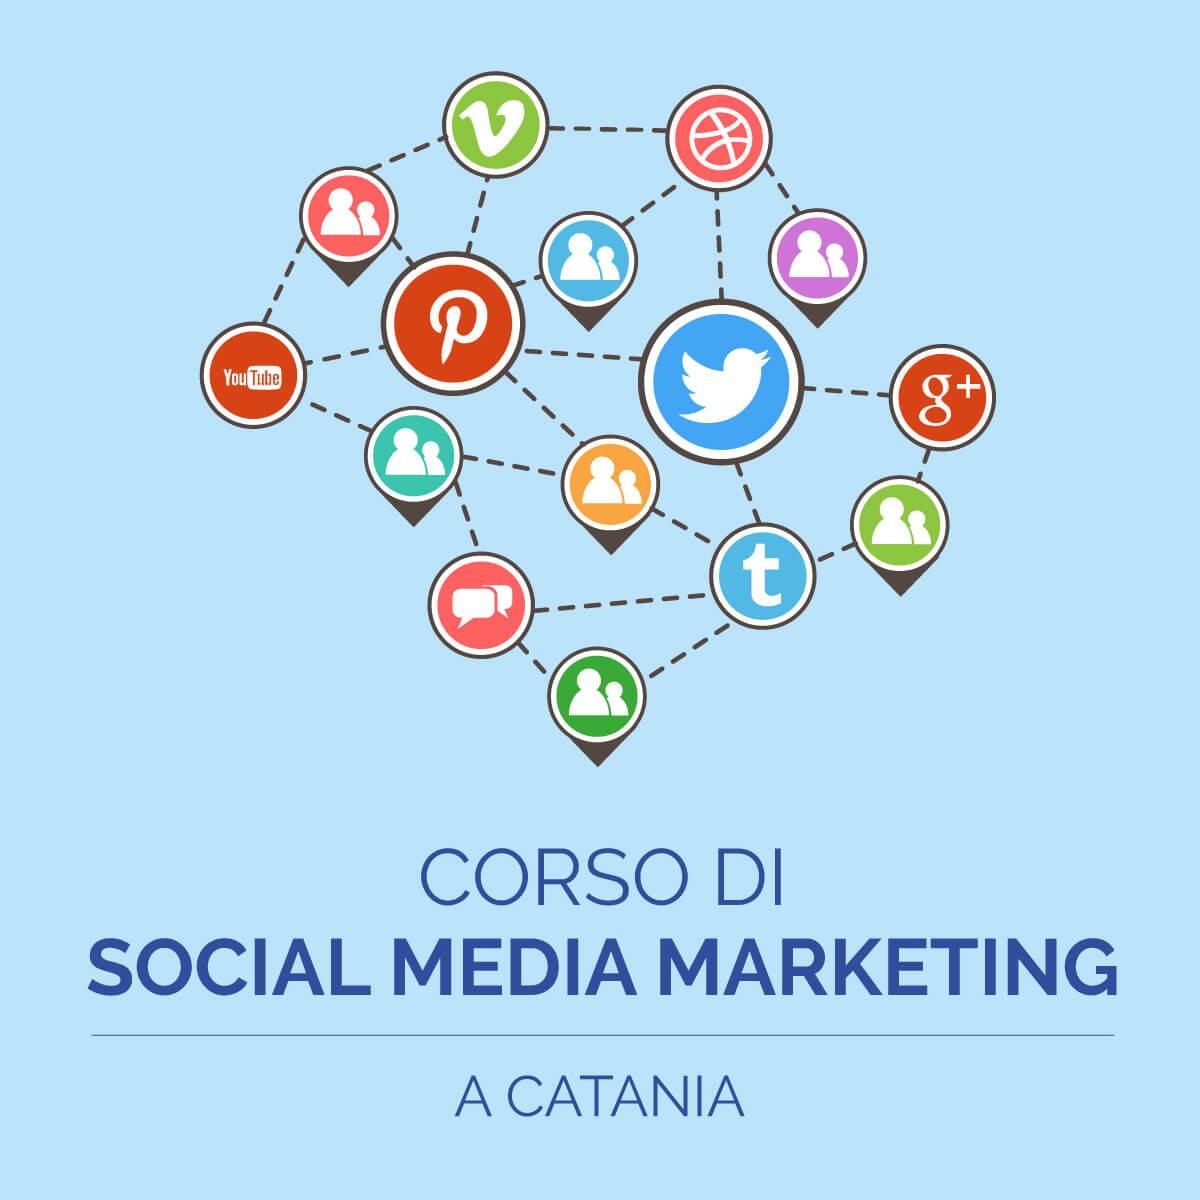 corso-social-media-marketing-catania